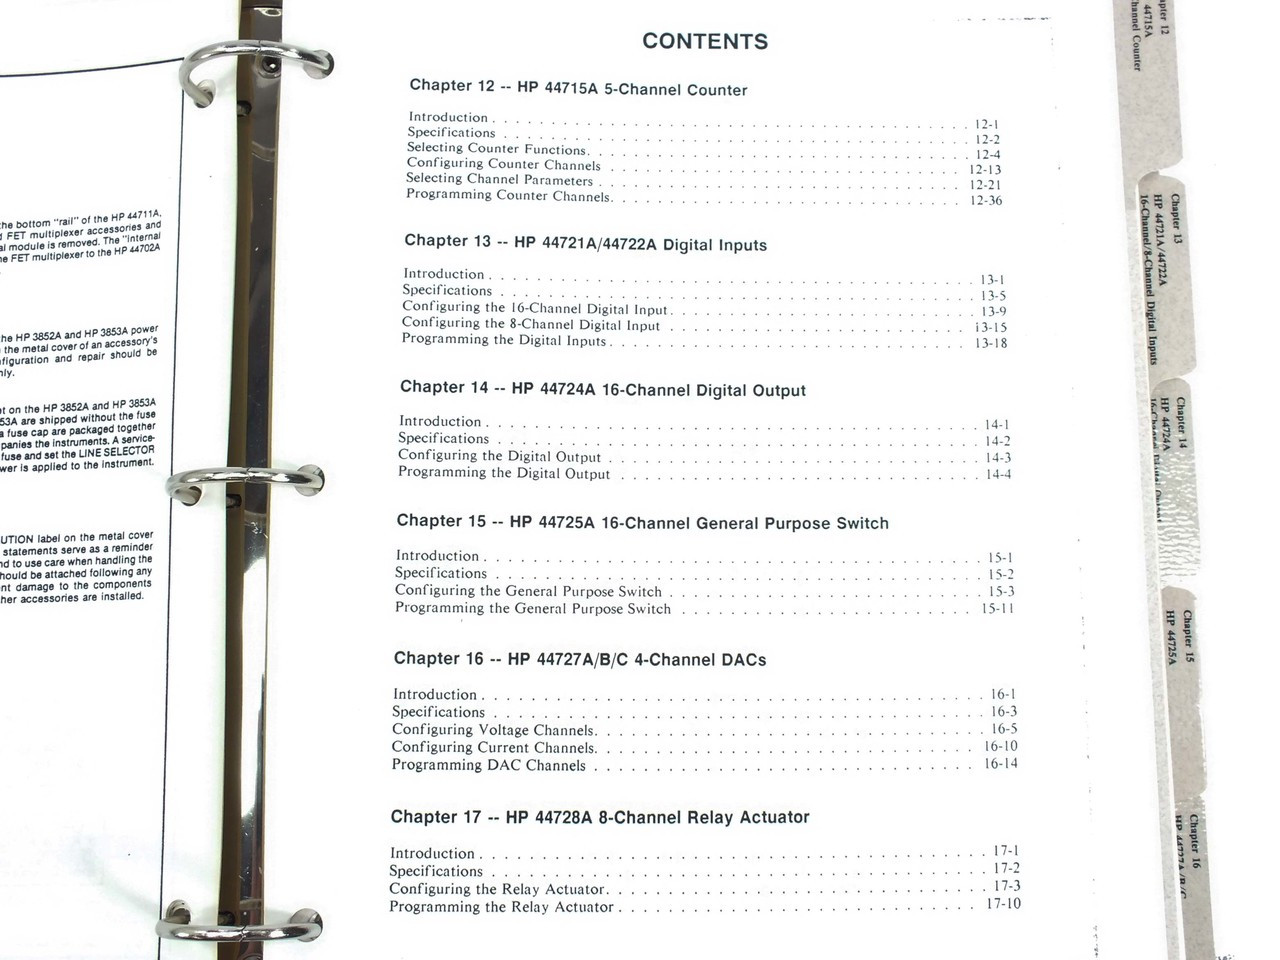 HP 3852A Data Acquisition/Control Unit Plug-In Accessories